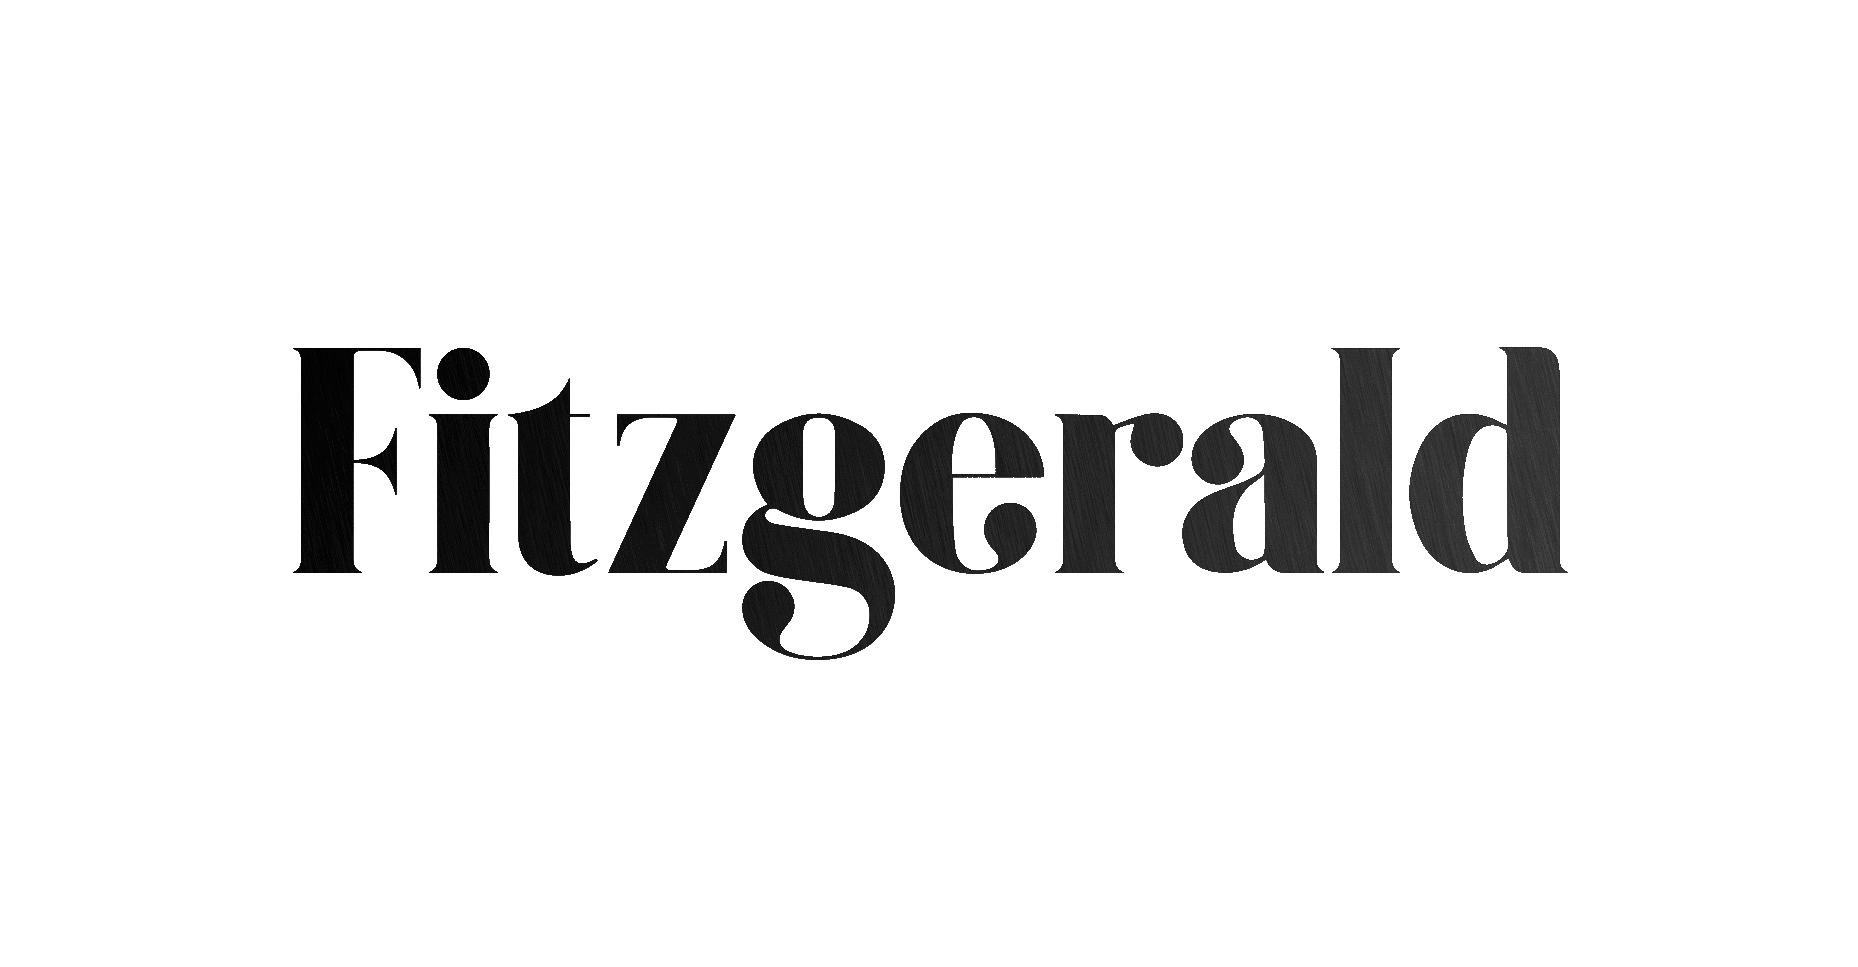 logo-fitzgerald-agenceeneplace